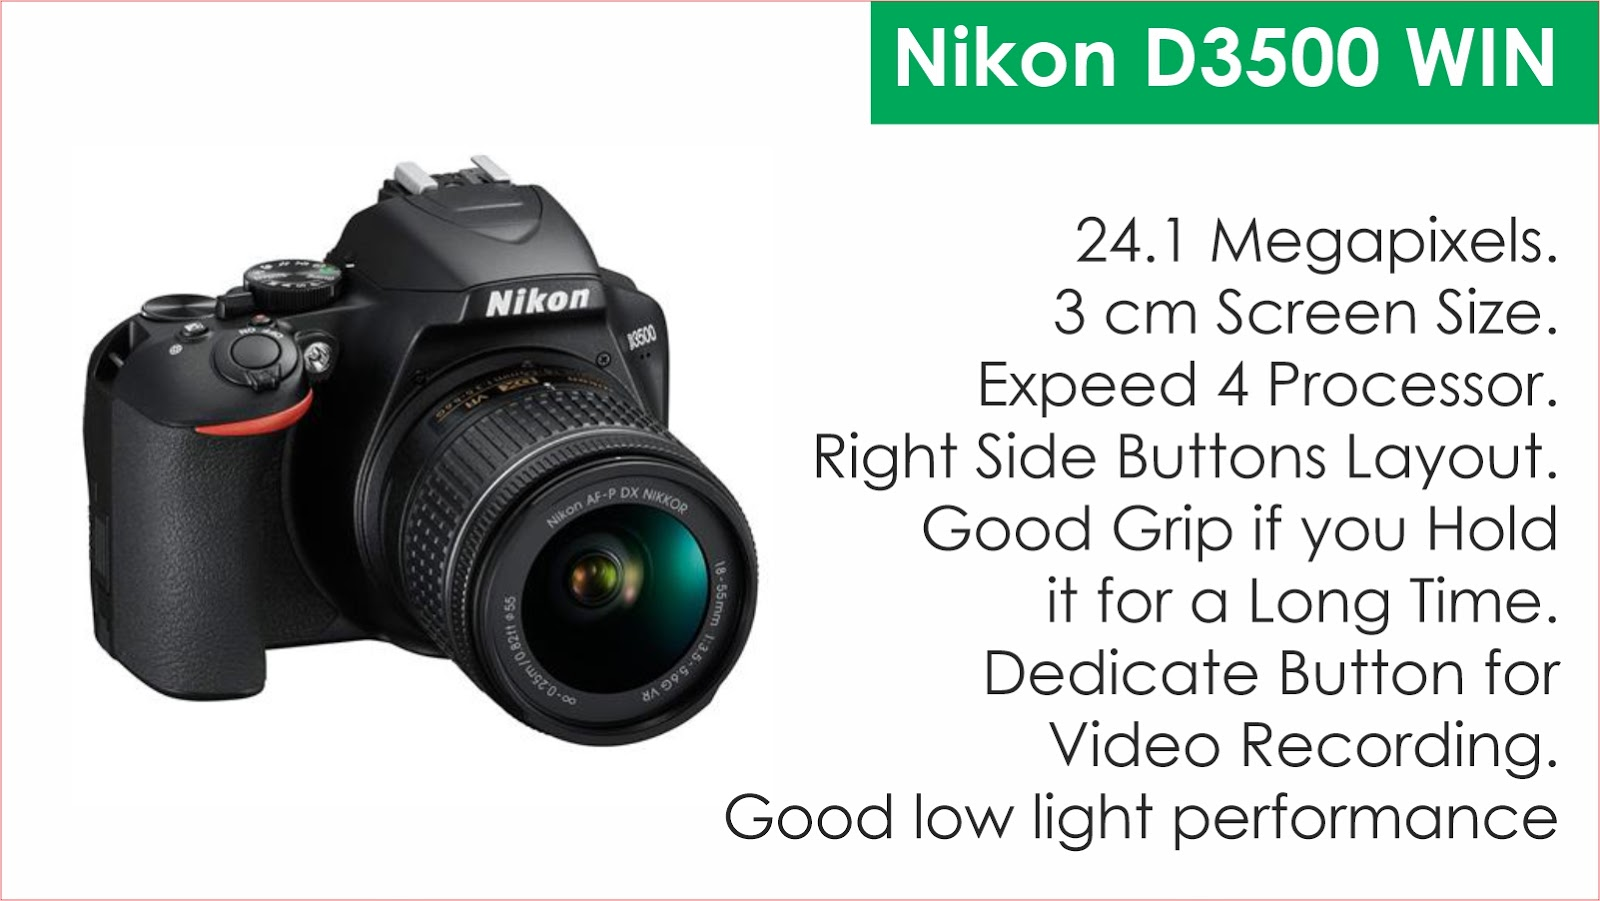 Nikon D3500 DSLR Camera Specifications